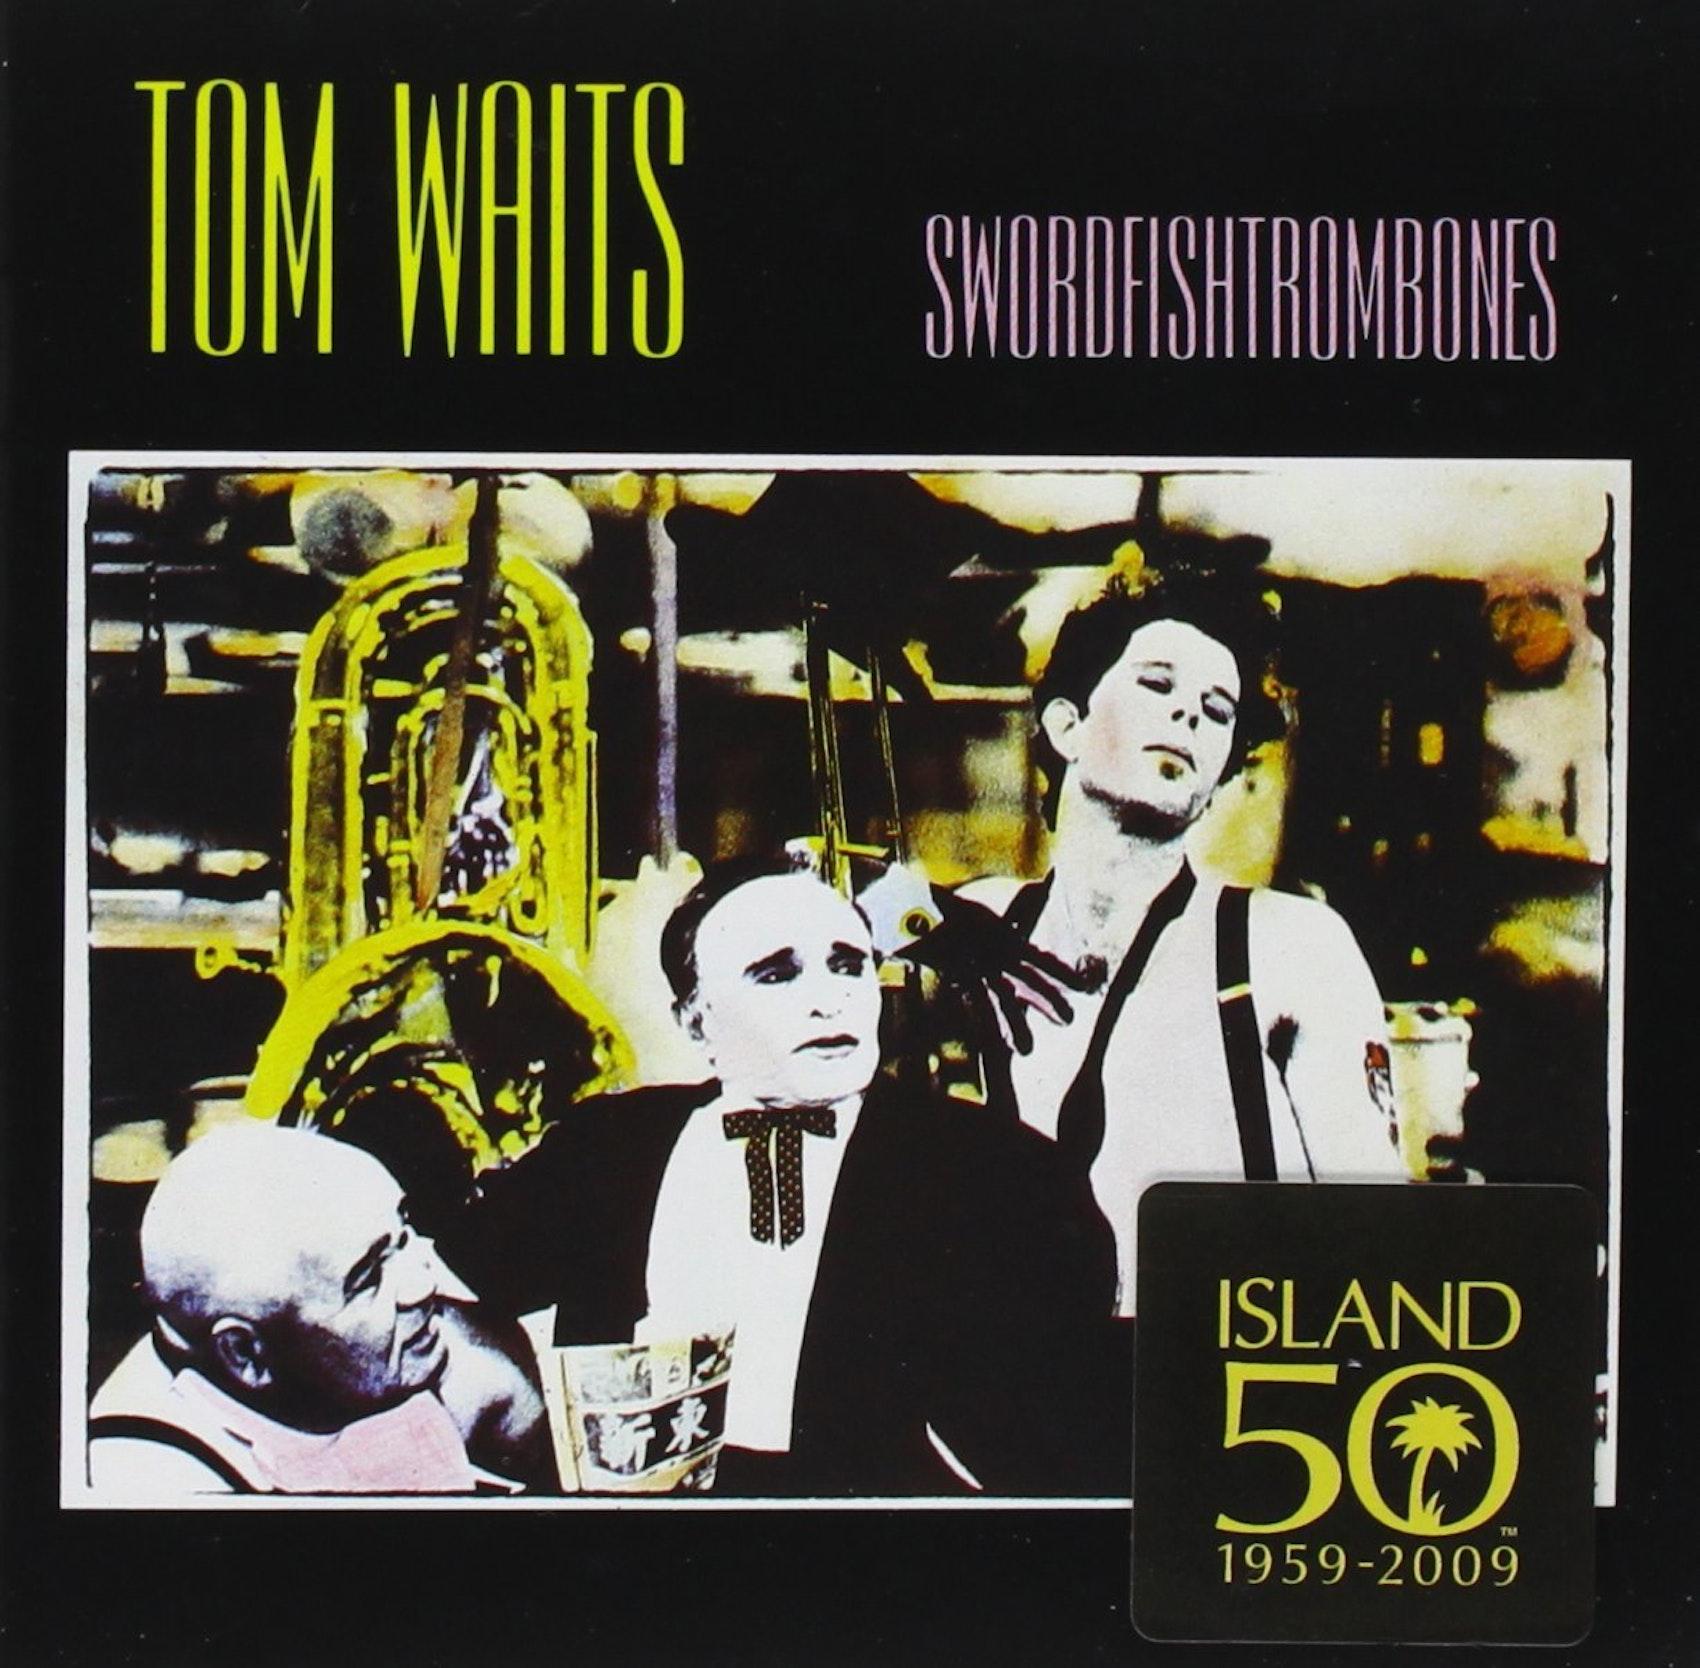 The 10 Best Tom Waits Albums To Own On Vinyl Vinyl Me